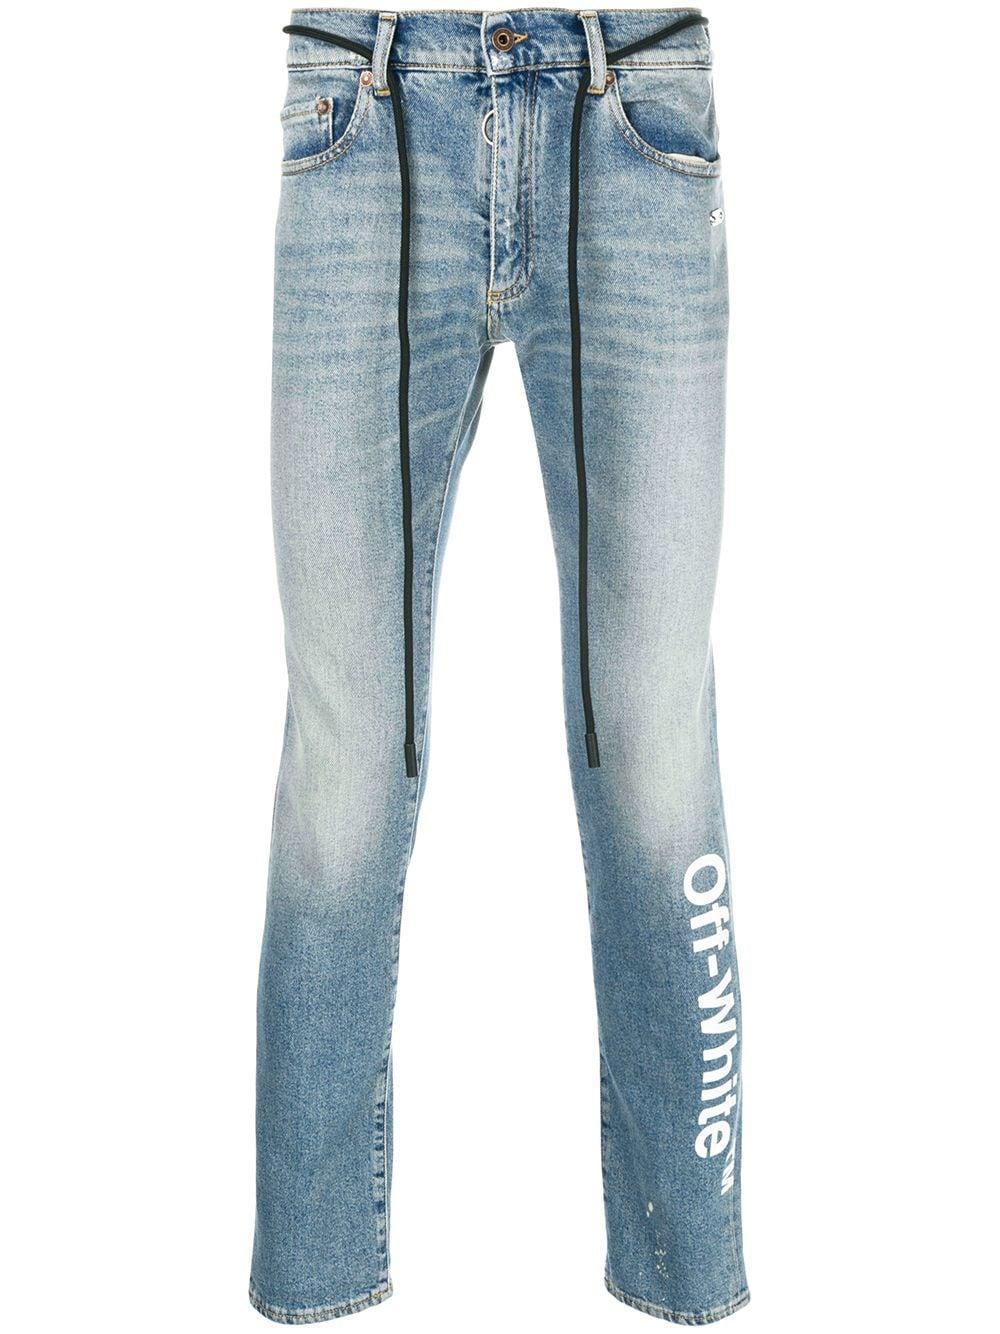 84d52c6b Off-White c/o Virgil Abloh Logo Slim-fit Jeans in Blue for Men - Lyst